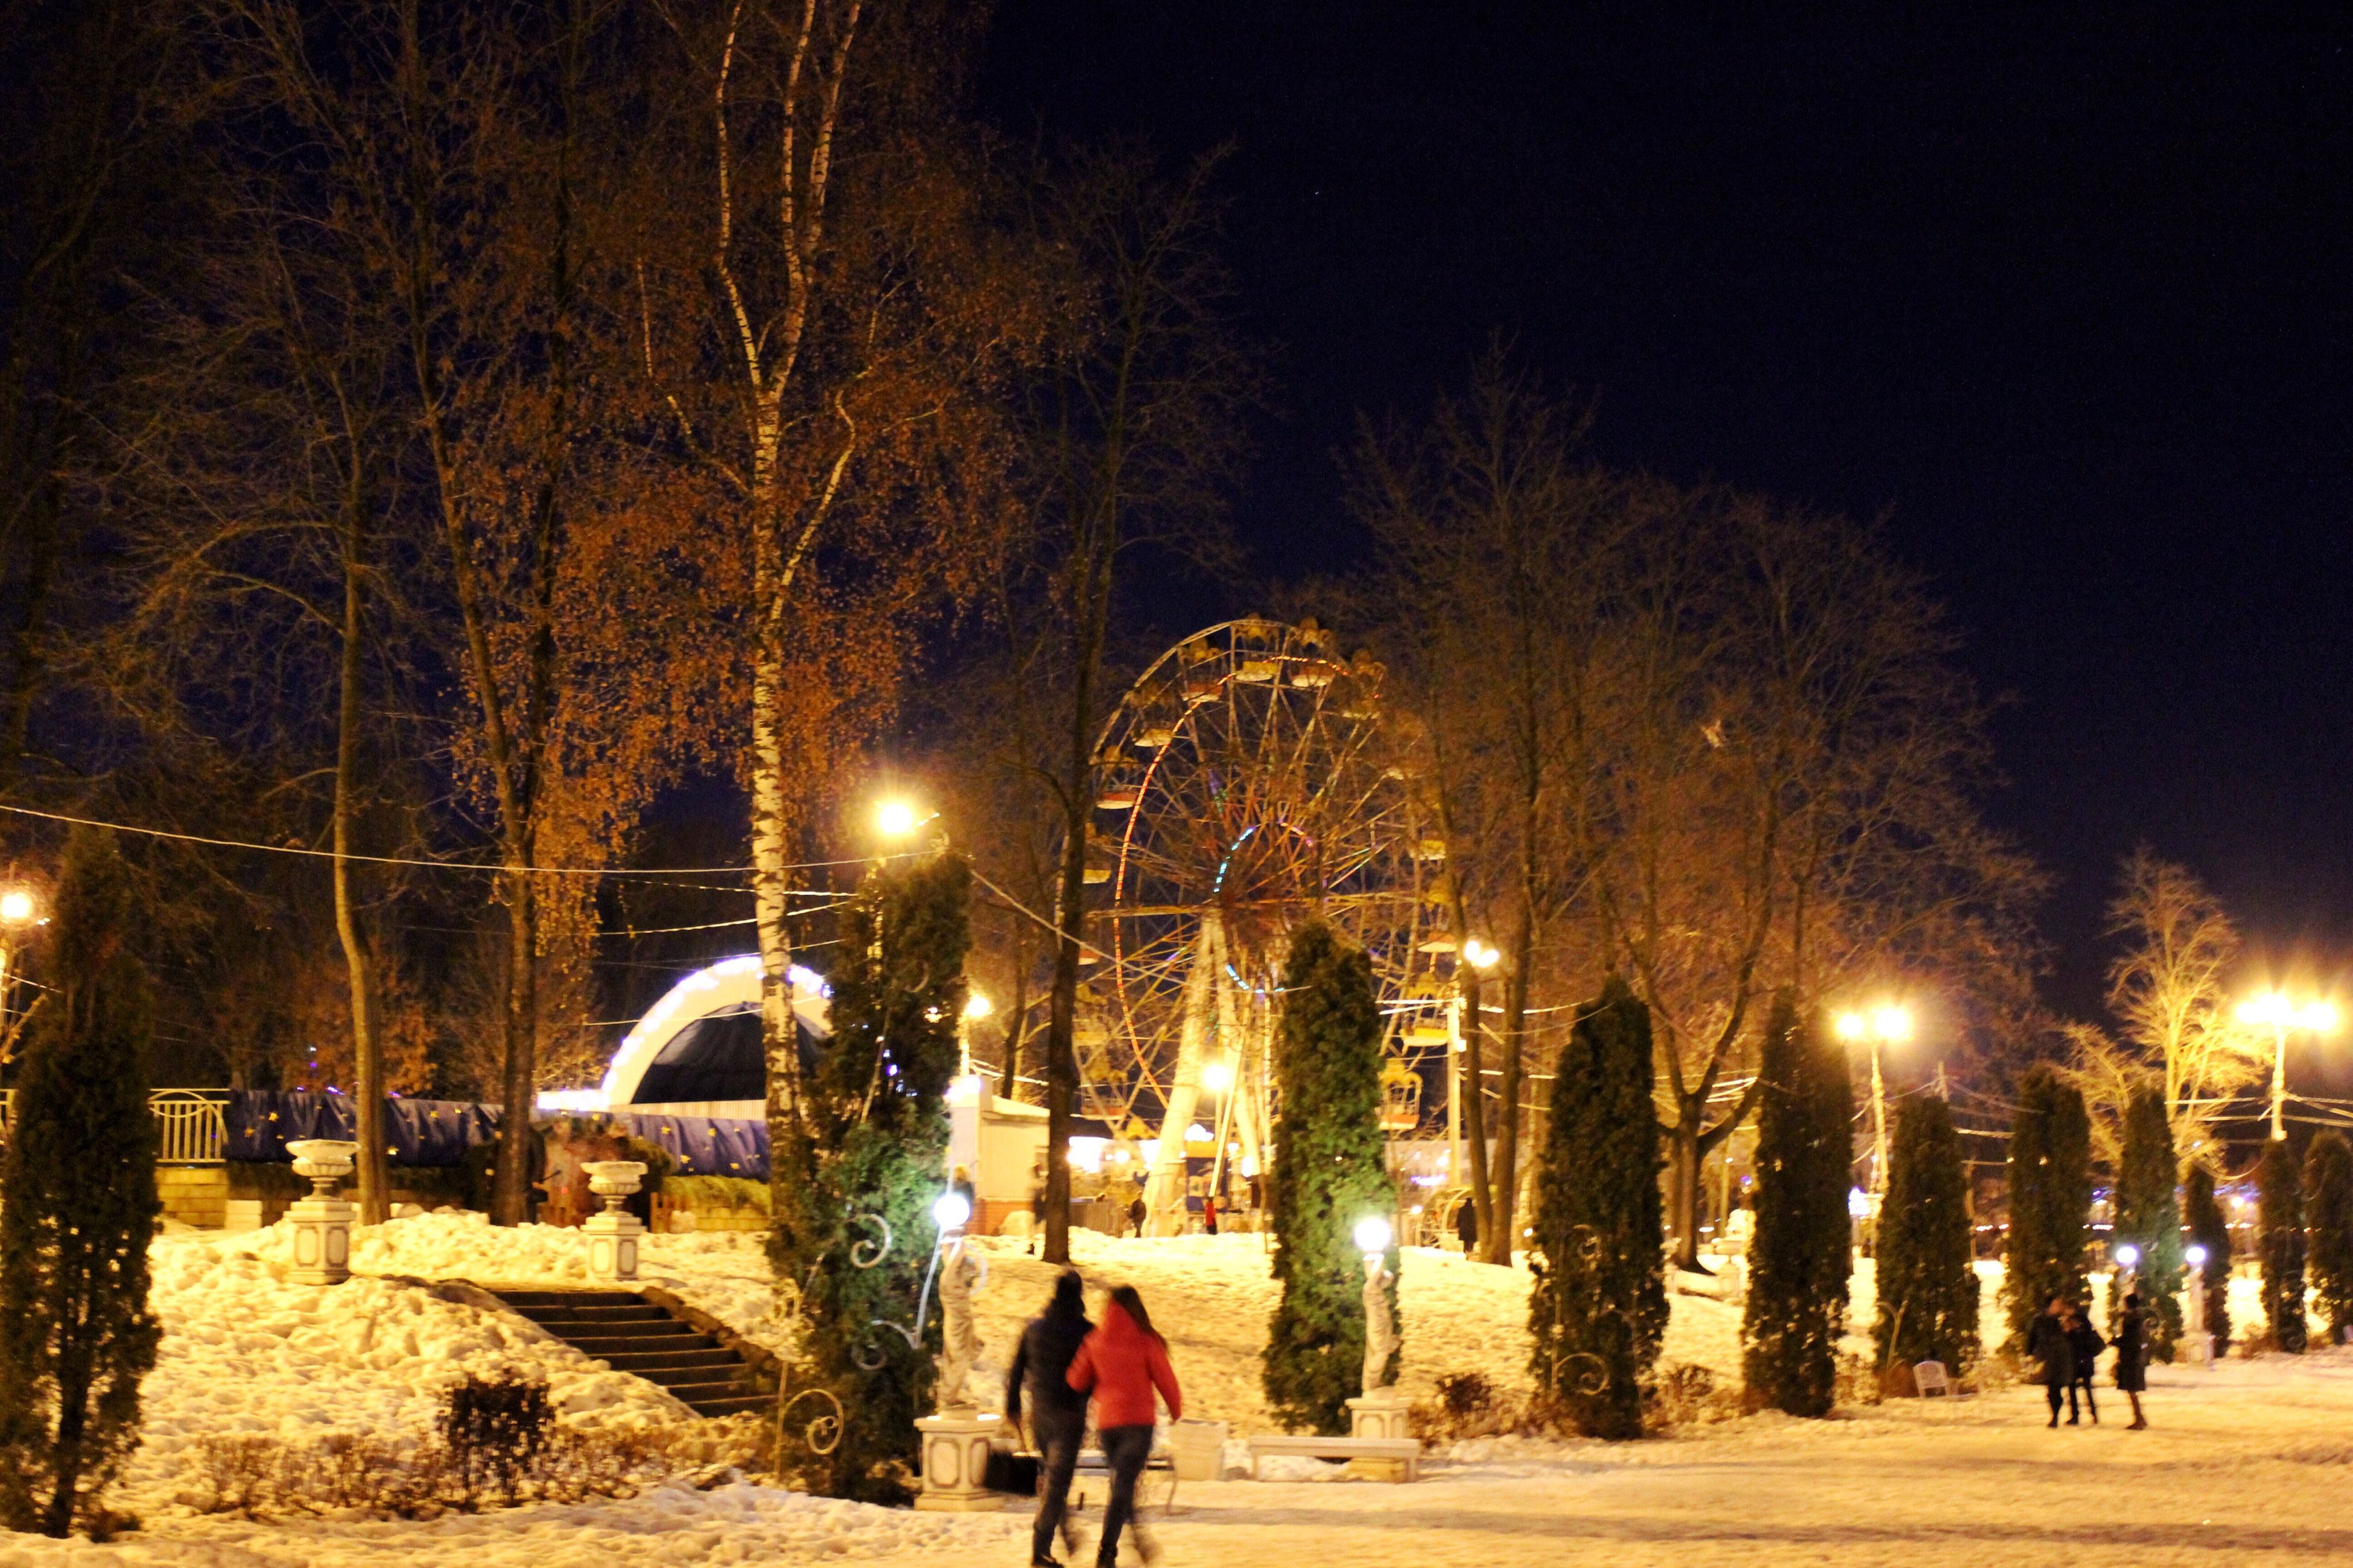 night, illuminated, street light, christmas, christmas decoration, tree, christmas lights, outdoors, celebration, people, city, christmas market, sky, architecture, christmas tree, adults only, adult, city gate